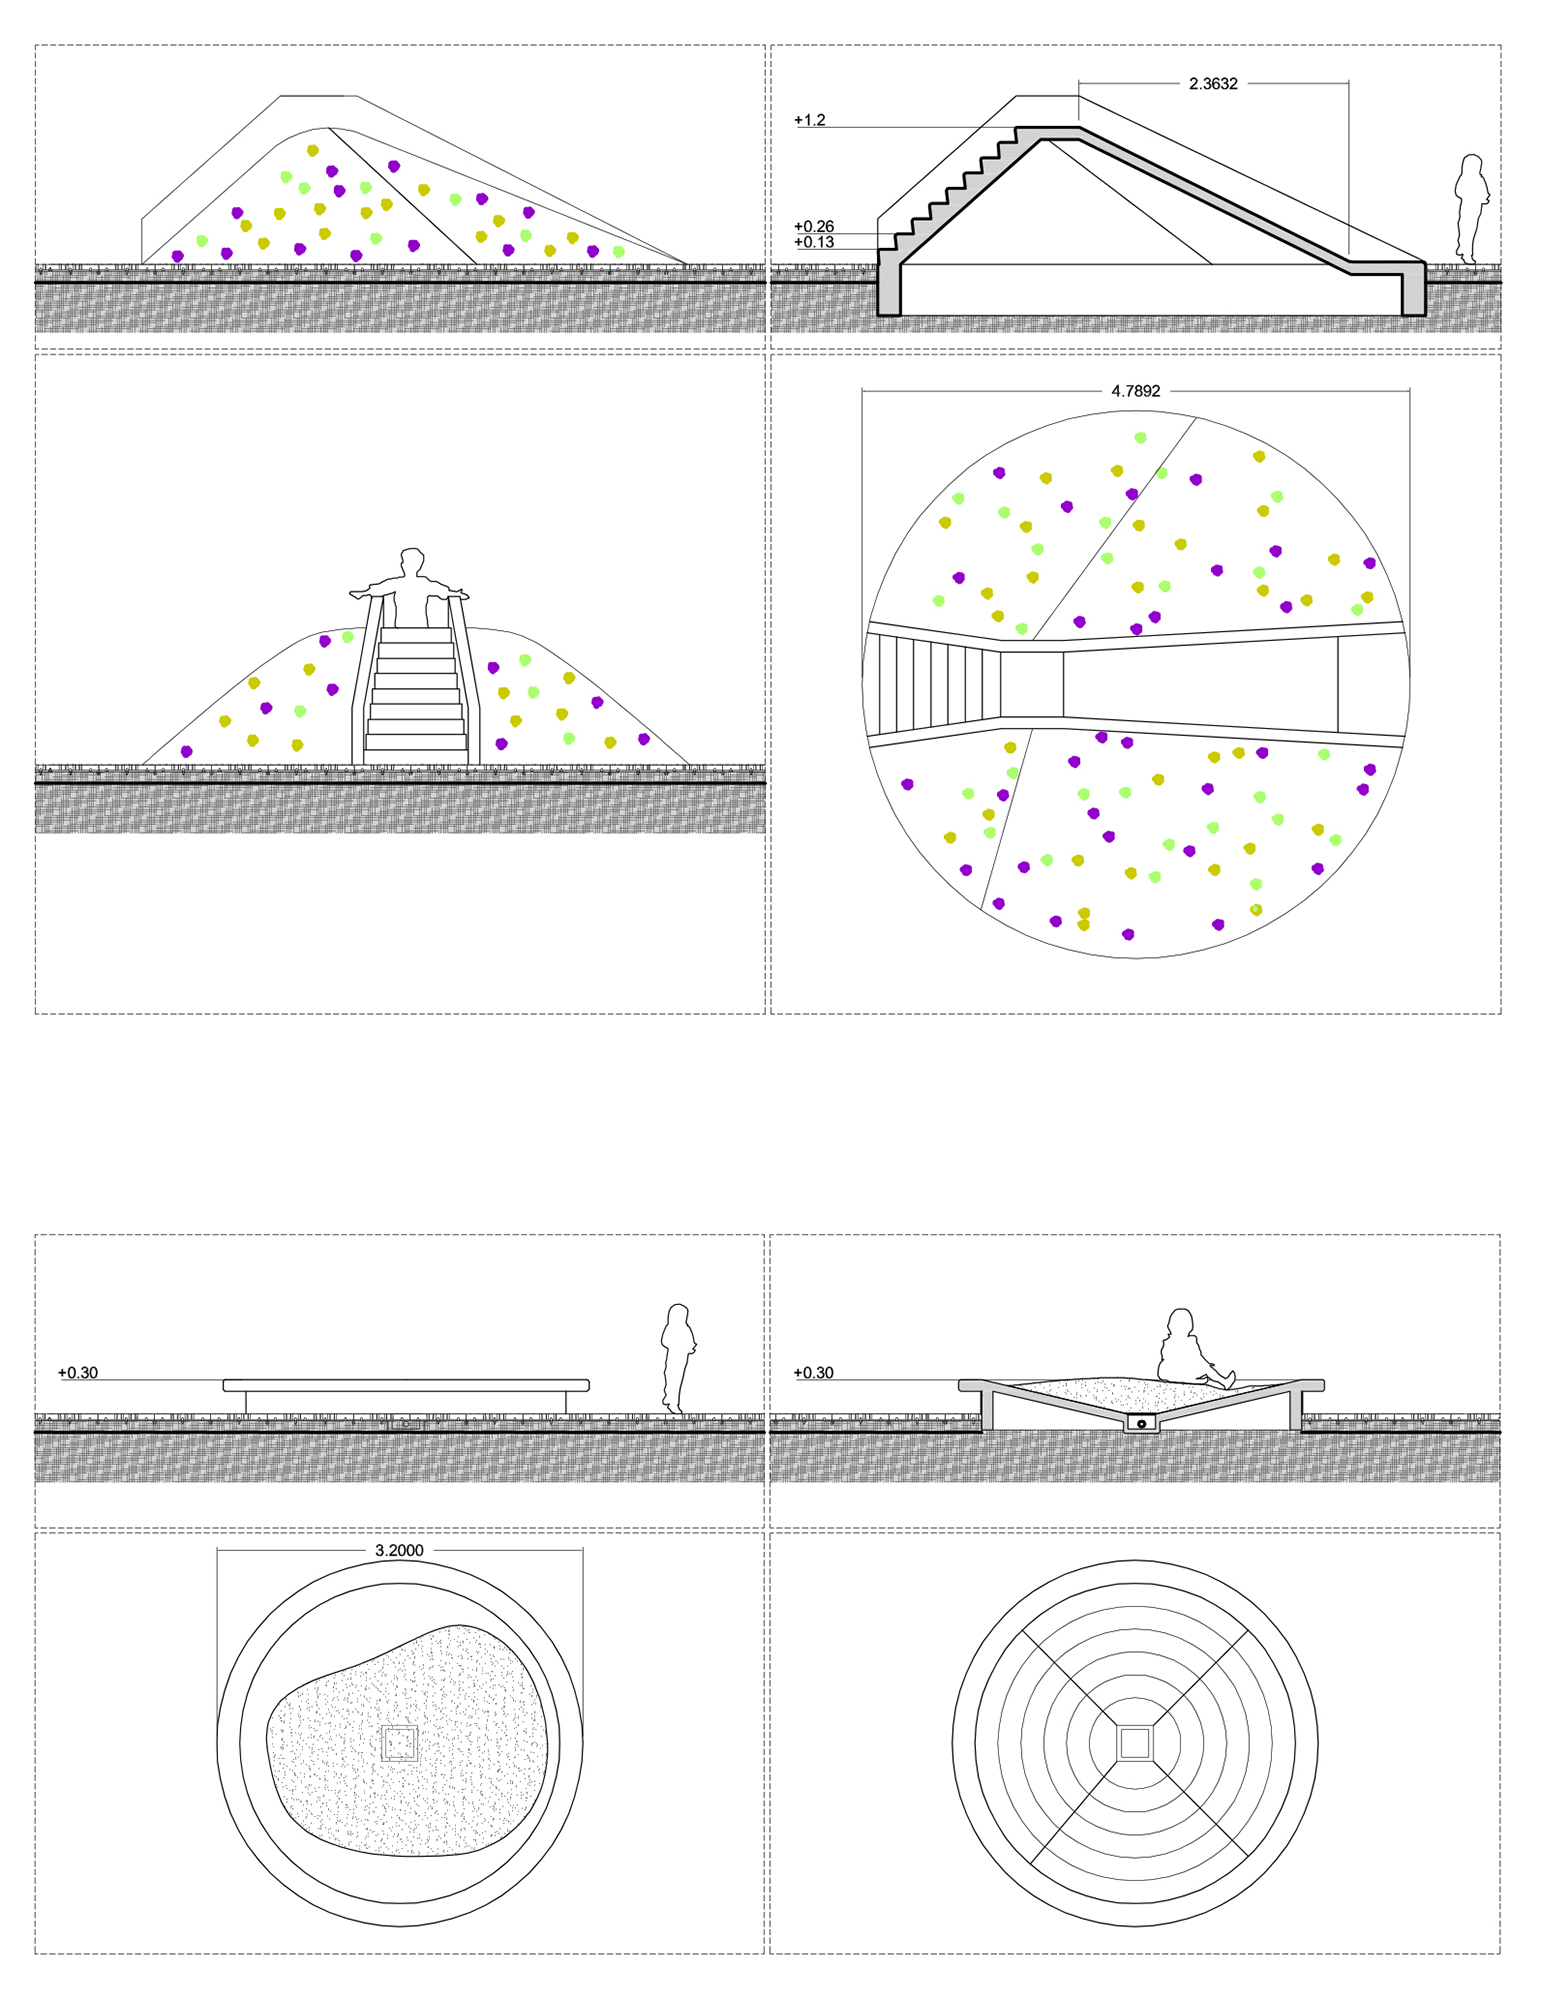 Architektur_offizin-a_gatto.weber.architekten_Projekte_Kultur_HiBaloo_08.jpg